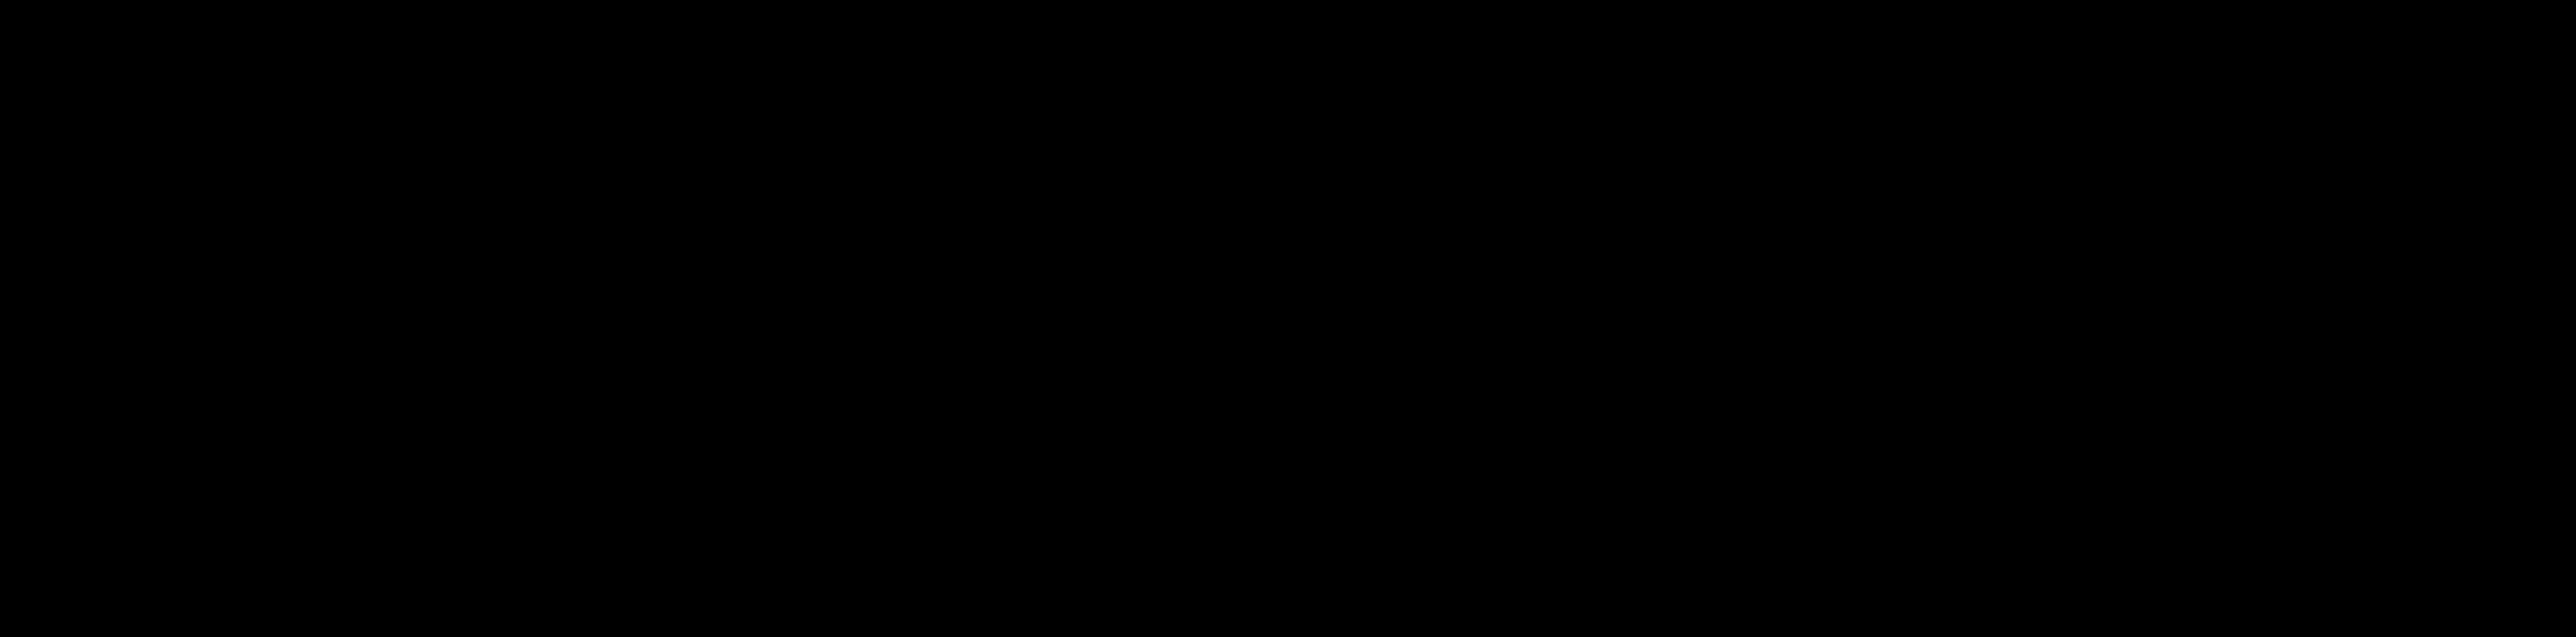 logotype-alt-2